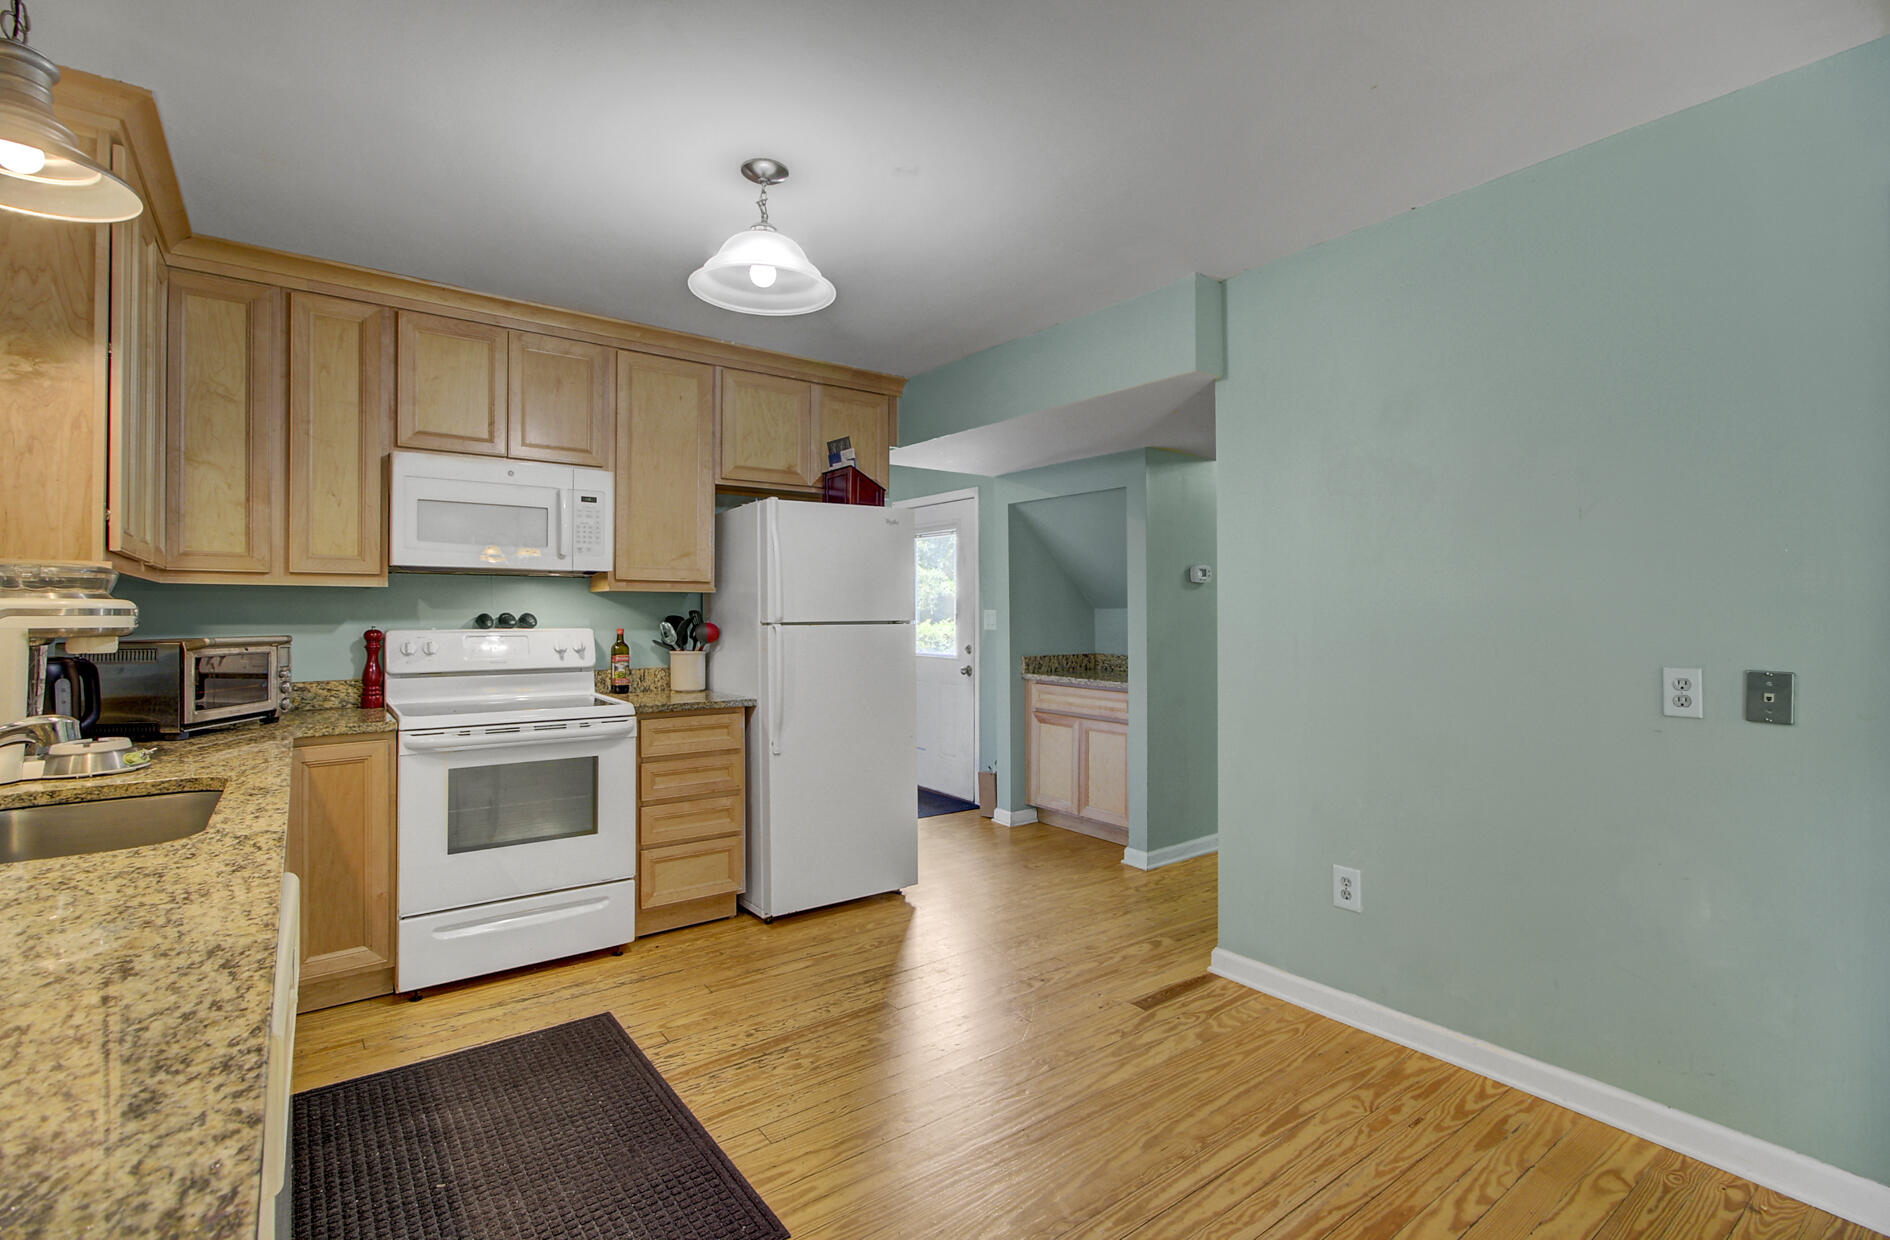 Yaugh Hall Homes For Sale - 1229 Porchers Bluff, Mount Pleasant, SC - 16